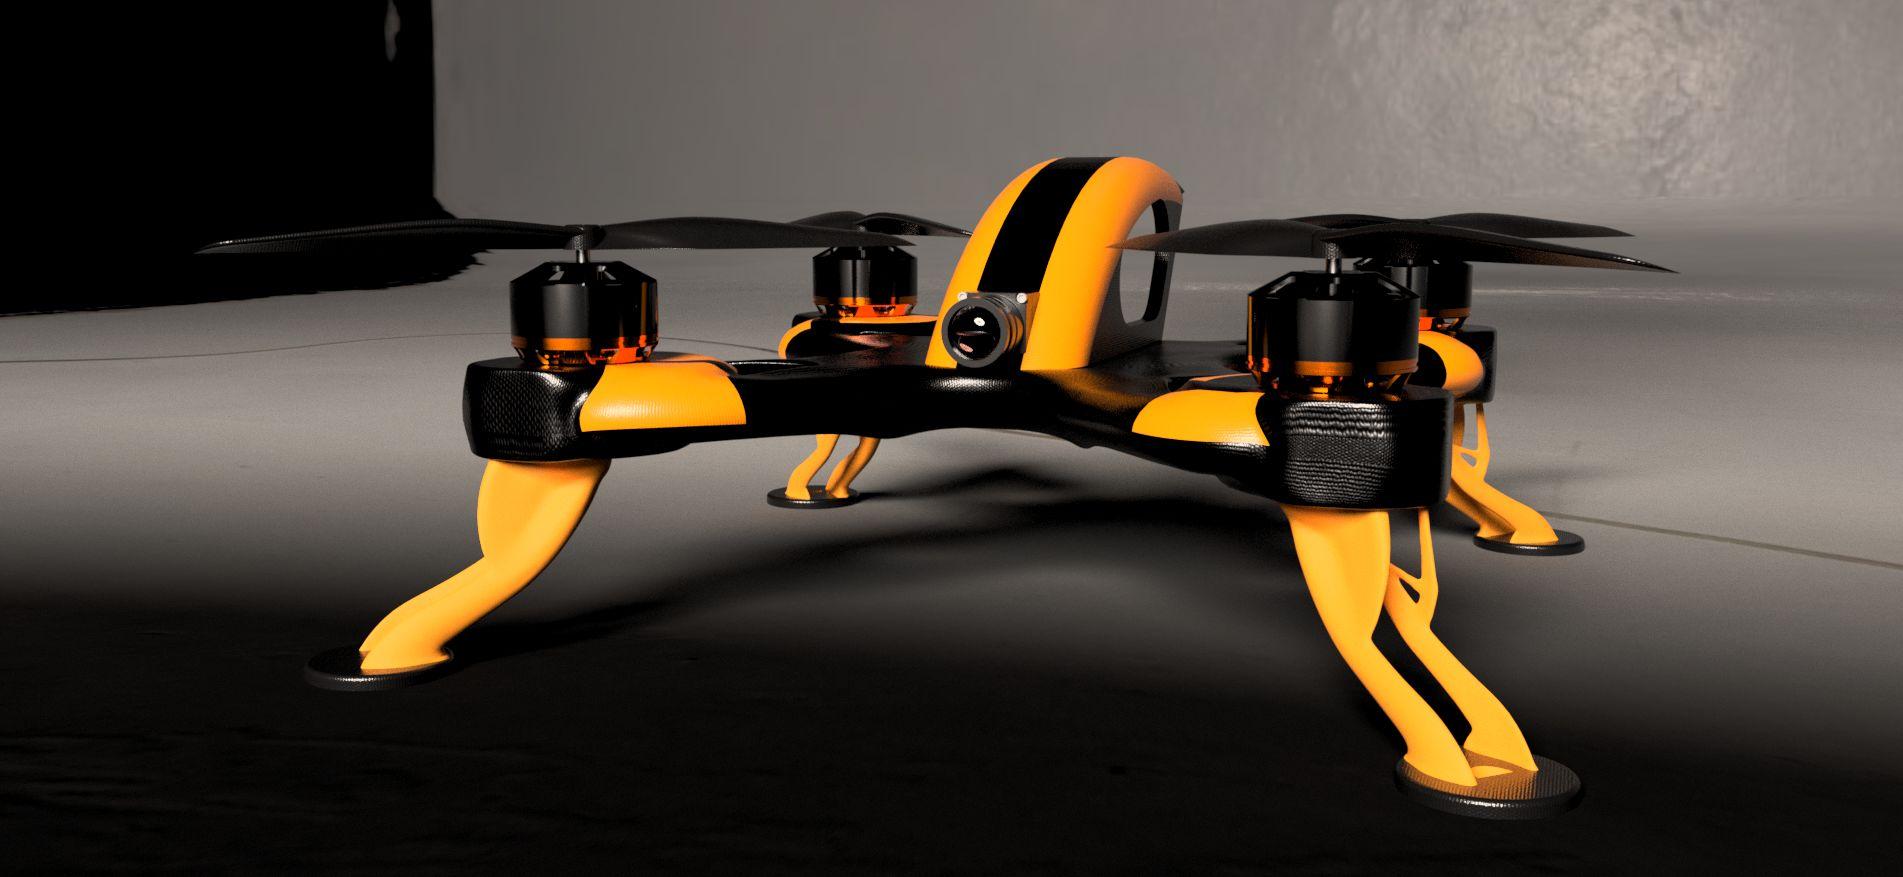 Dronegenerative-3500-3500